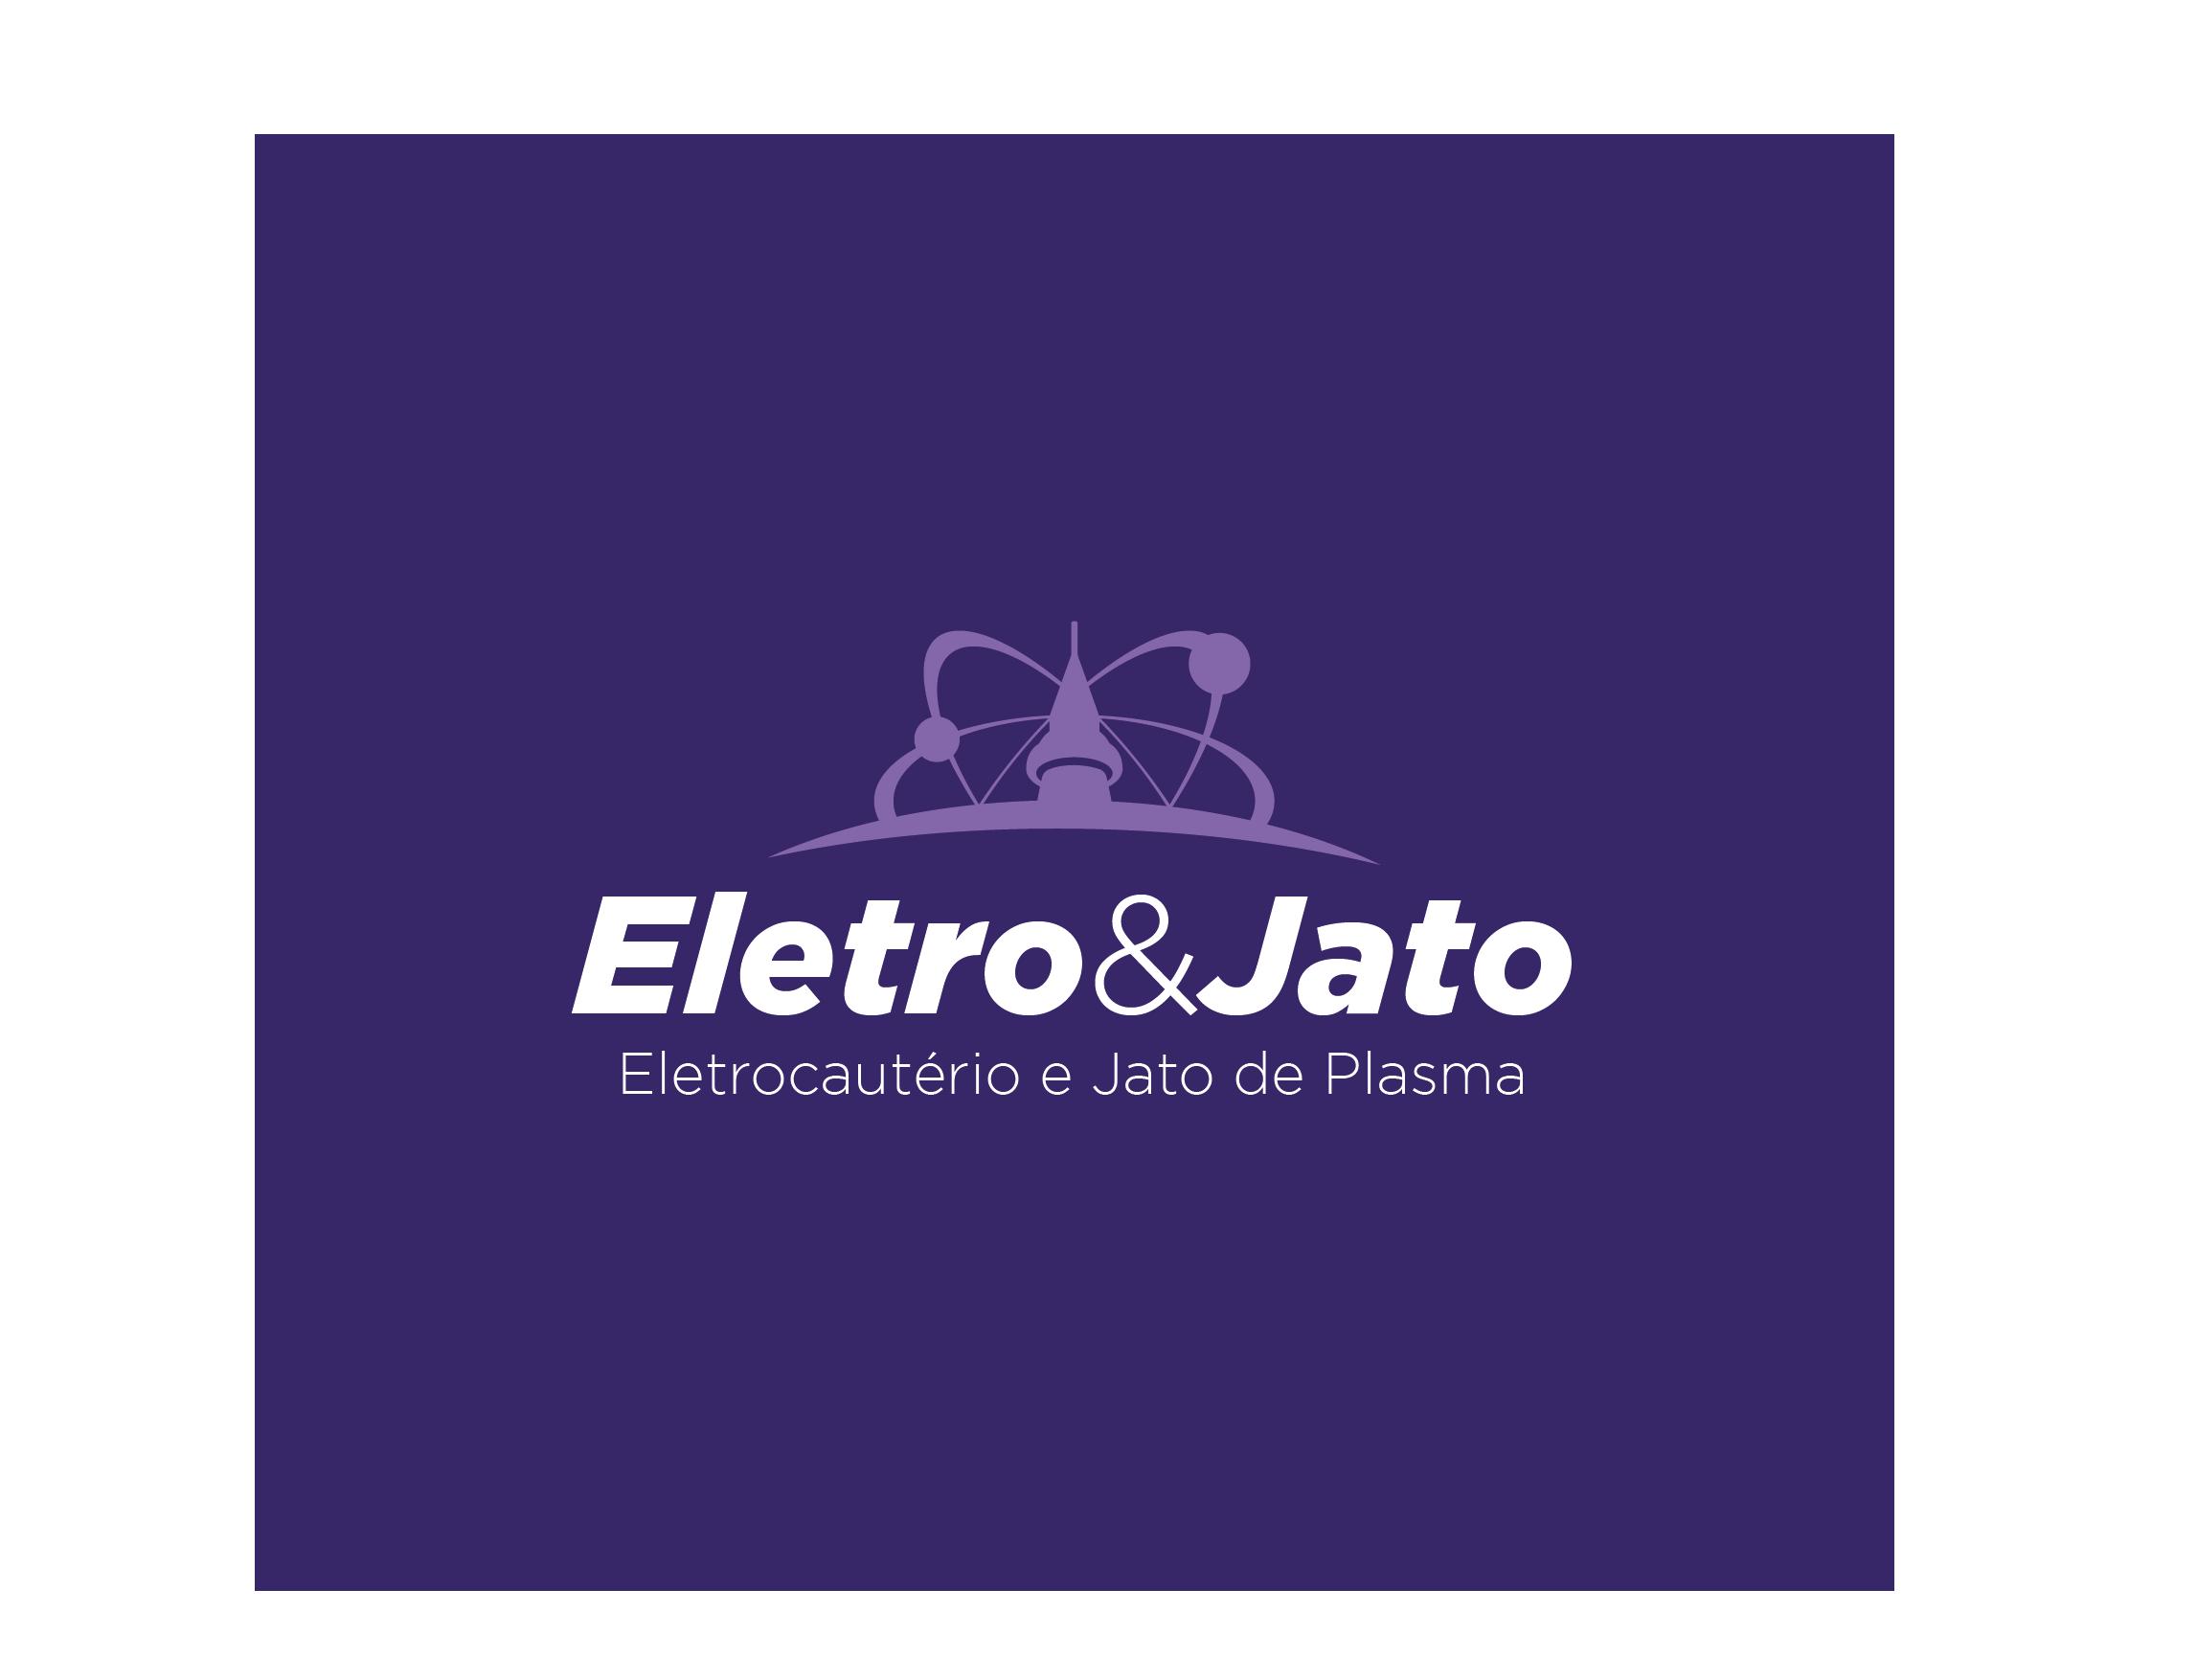 Imersão Eletro & Jato - Eletrocautério e Jato de Plasma